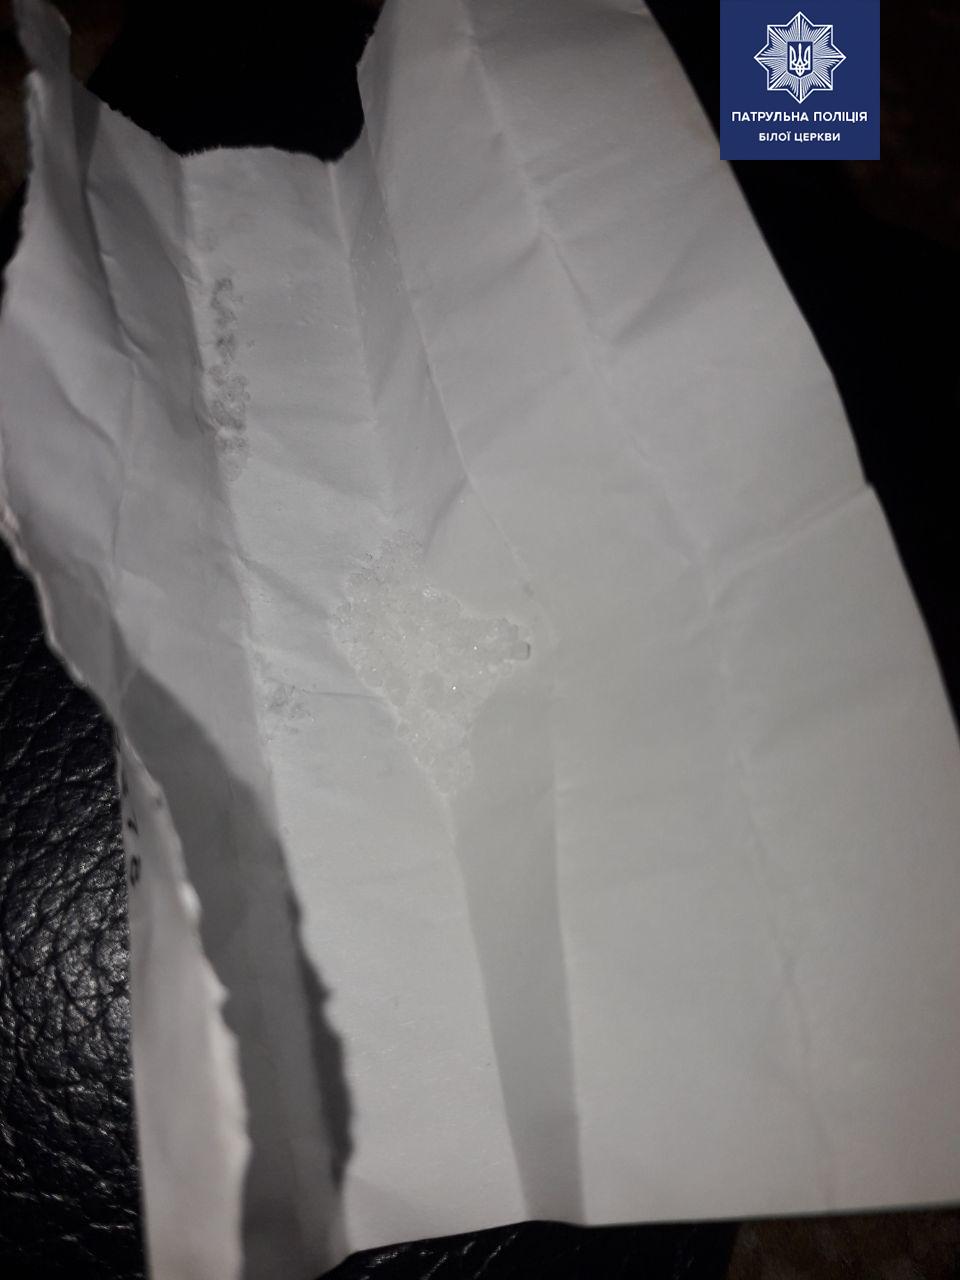 Біла Церква: порушив ПДР – знайшли наркотики - наркотики - 121532930 1801973633303022 438782593964290340 o